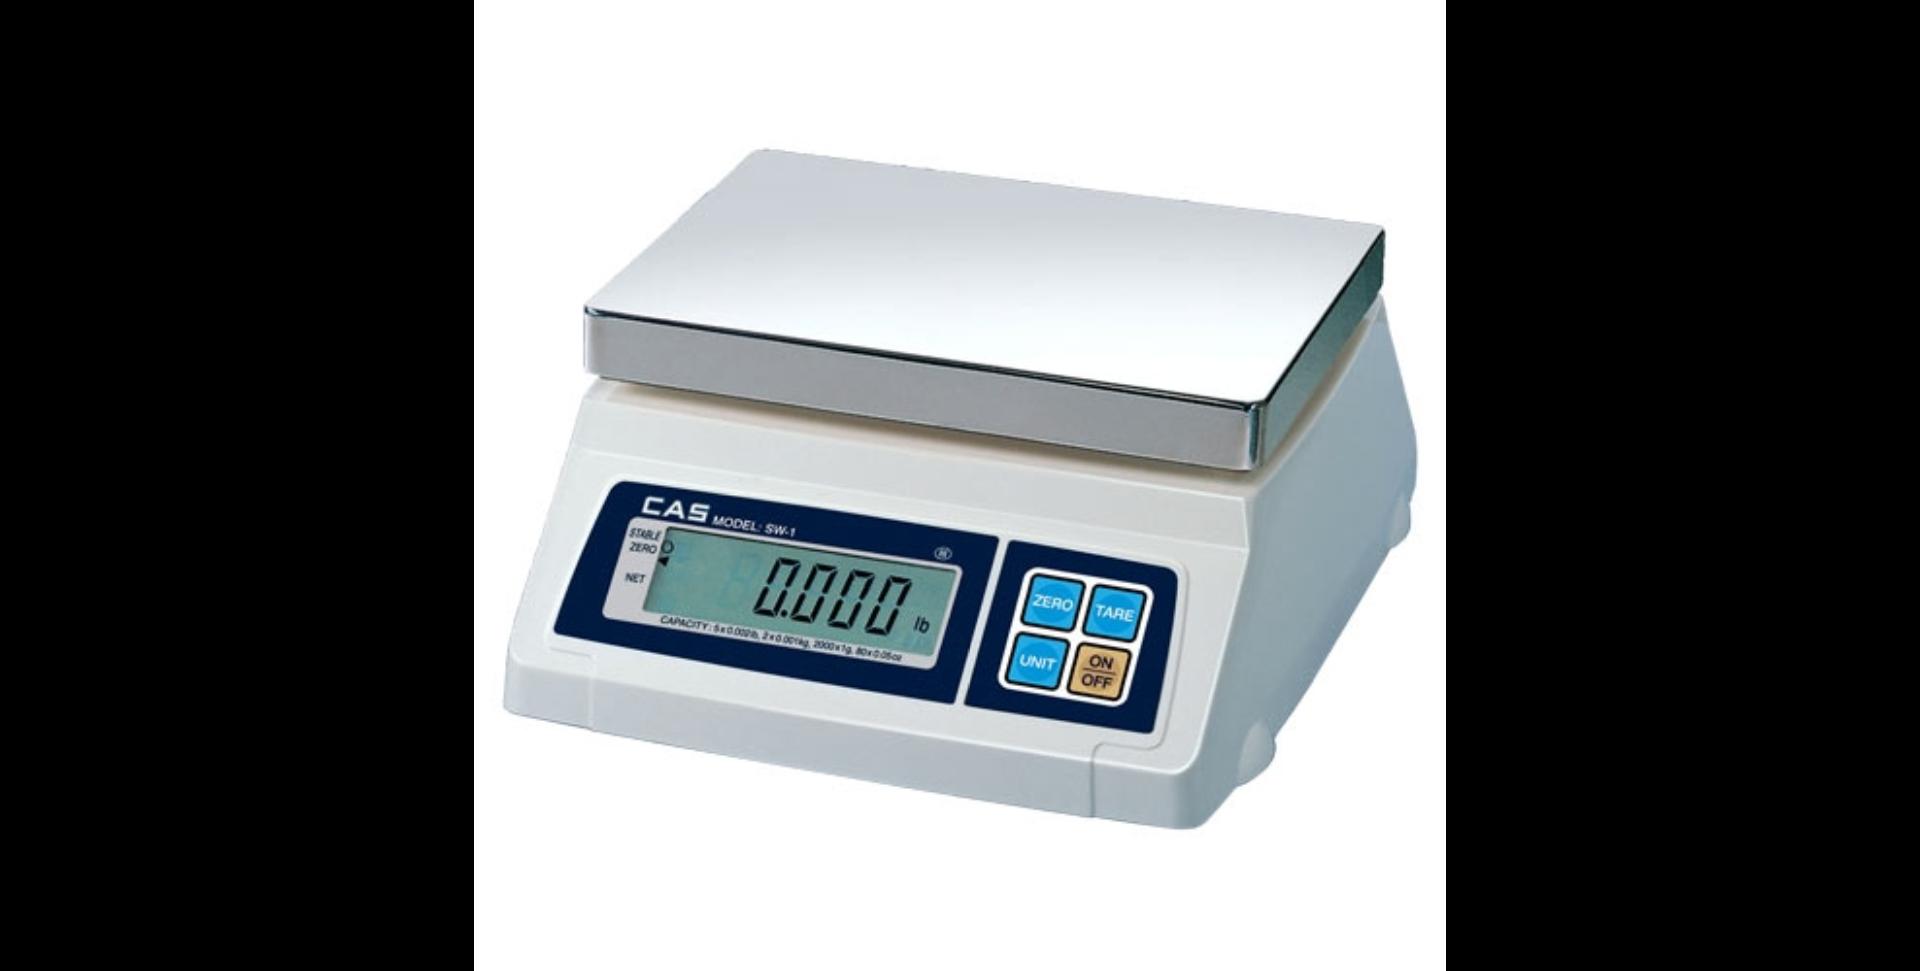 CAS elektronska trgovačka vaga SW-1S 1-2kg